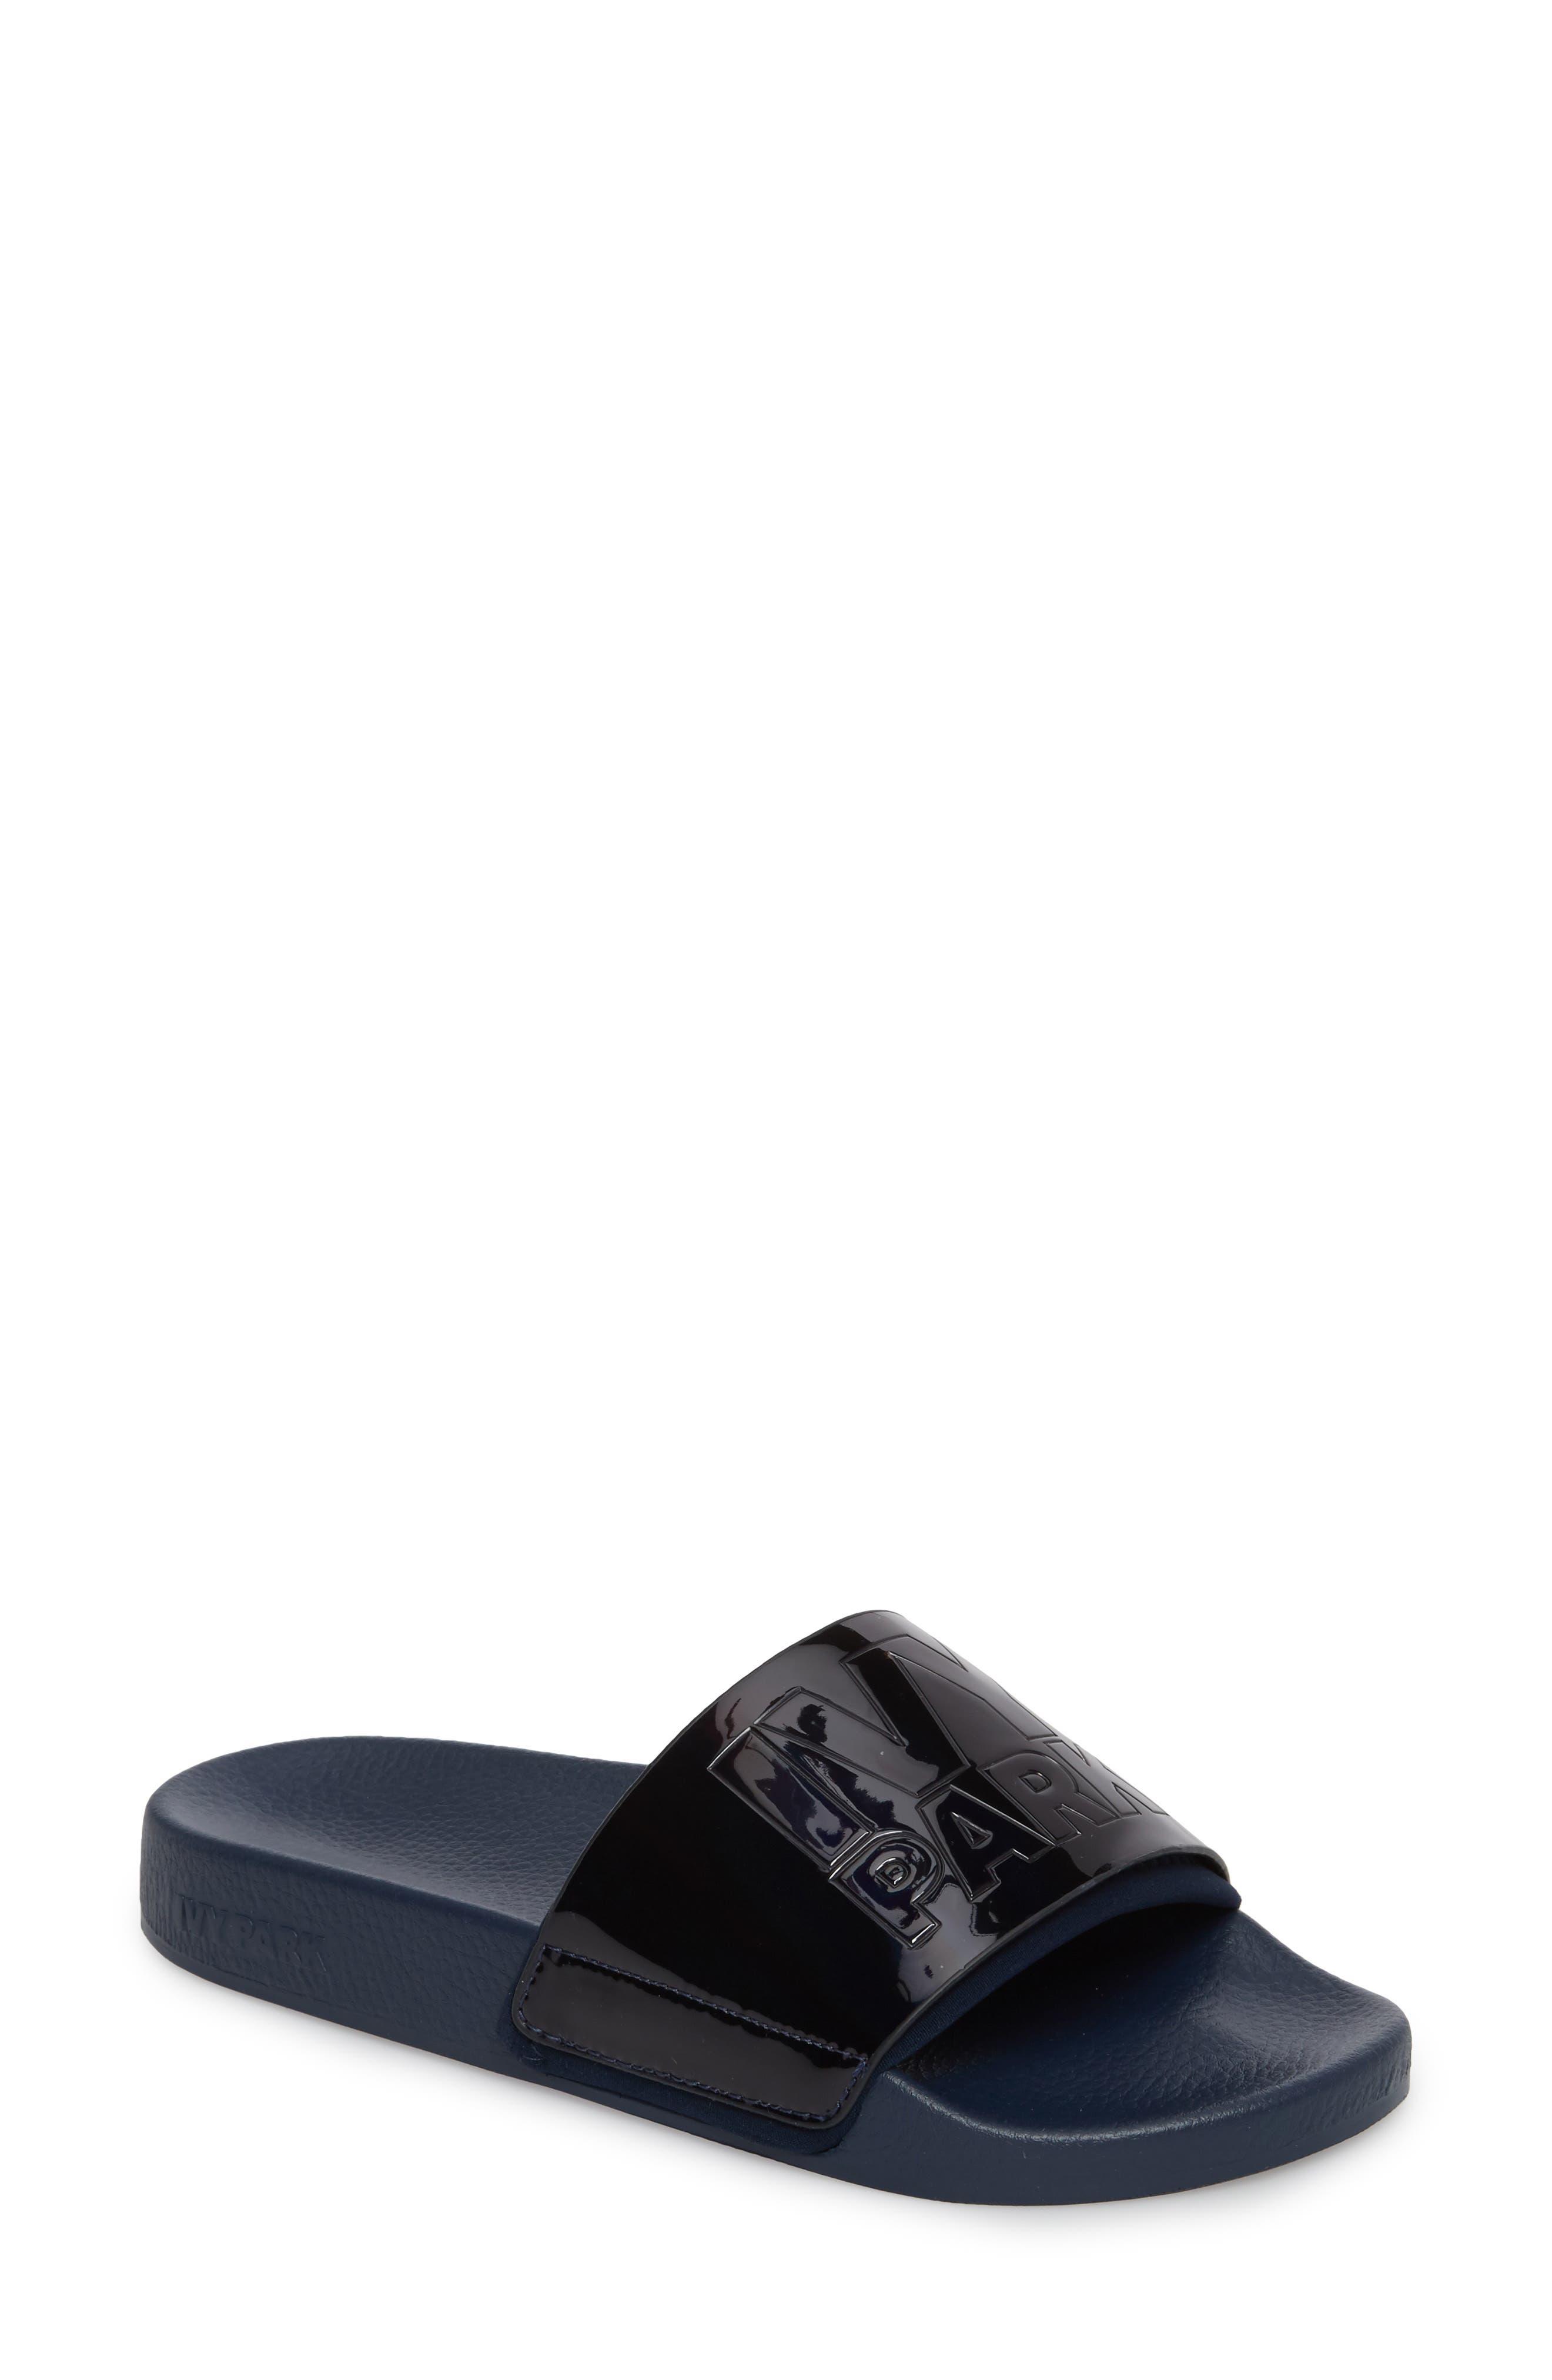 Slide Sandal,                             Main thumbnail 1, color,                             410